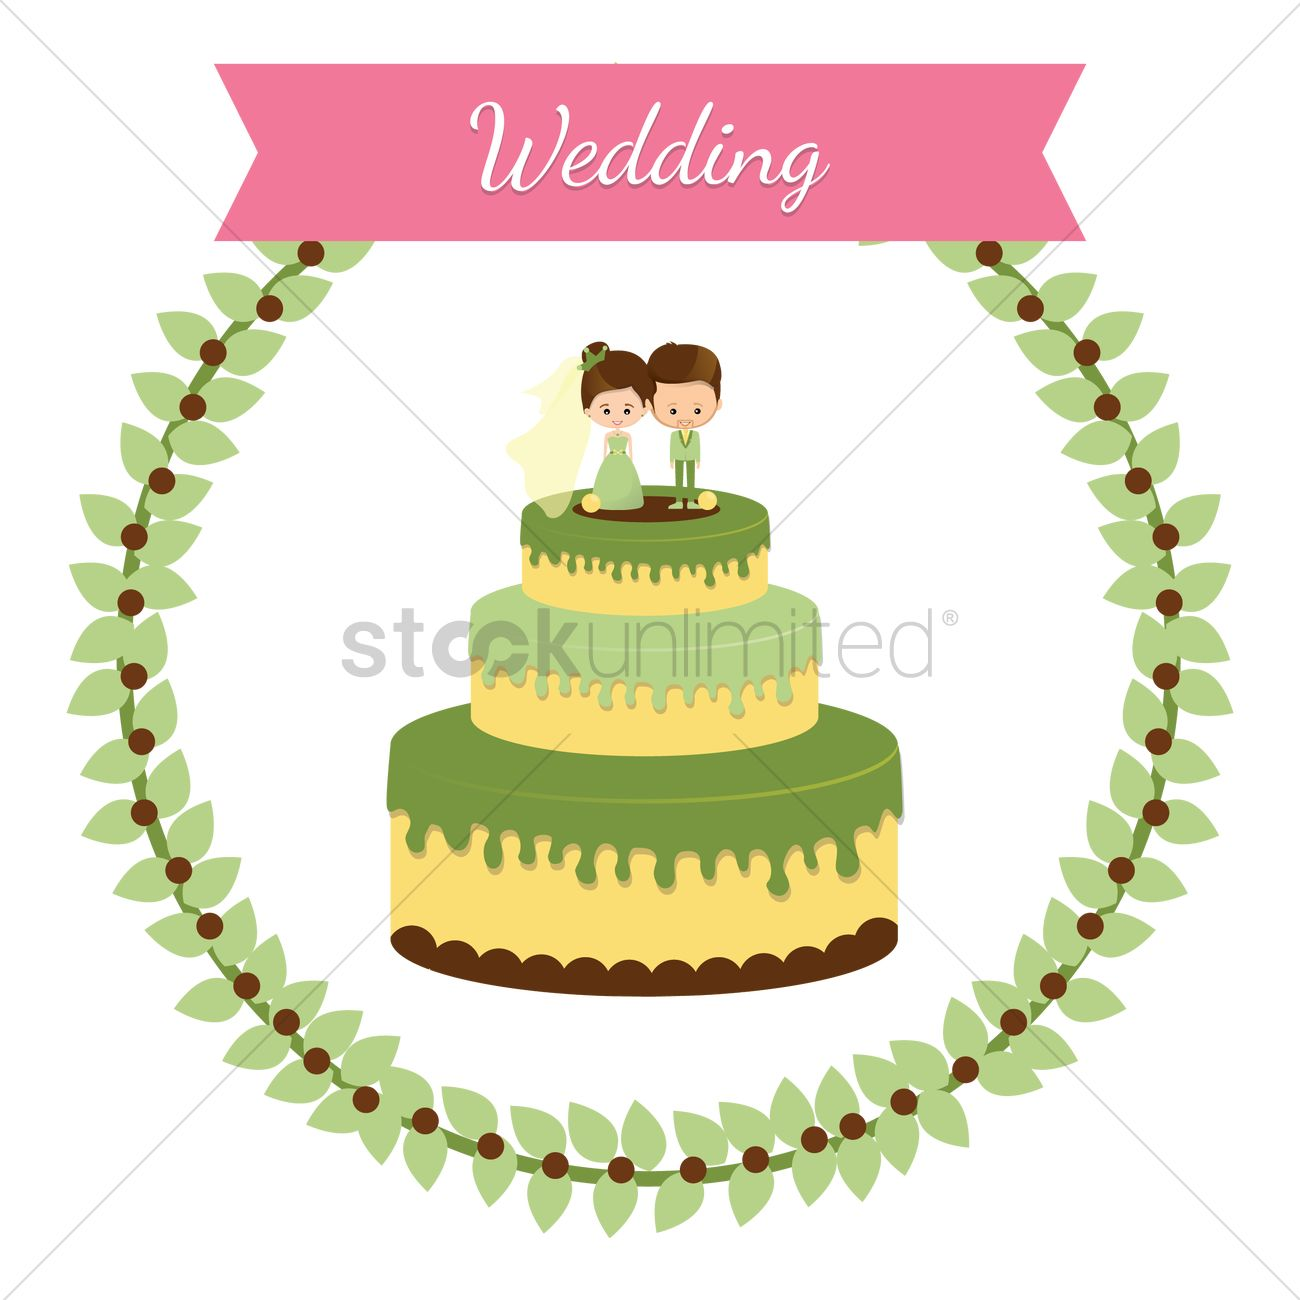 Wedding cake Vector Image - 1349706 | StockUnlimited